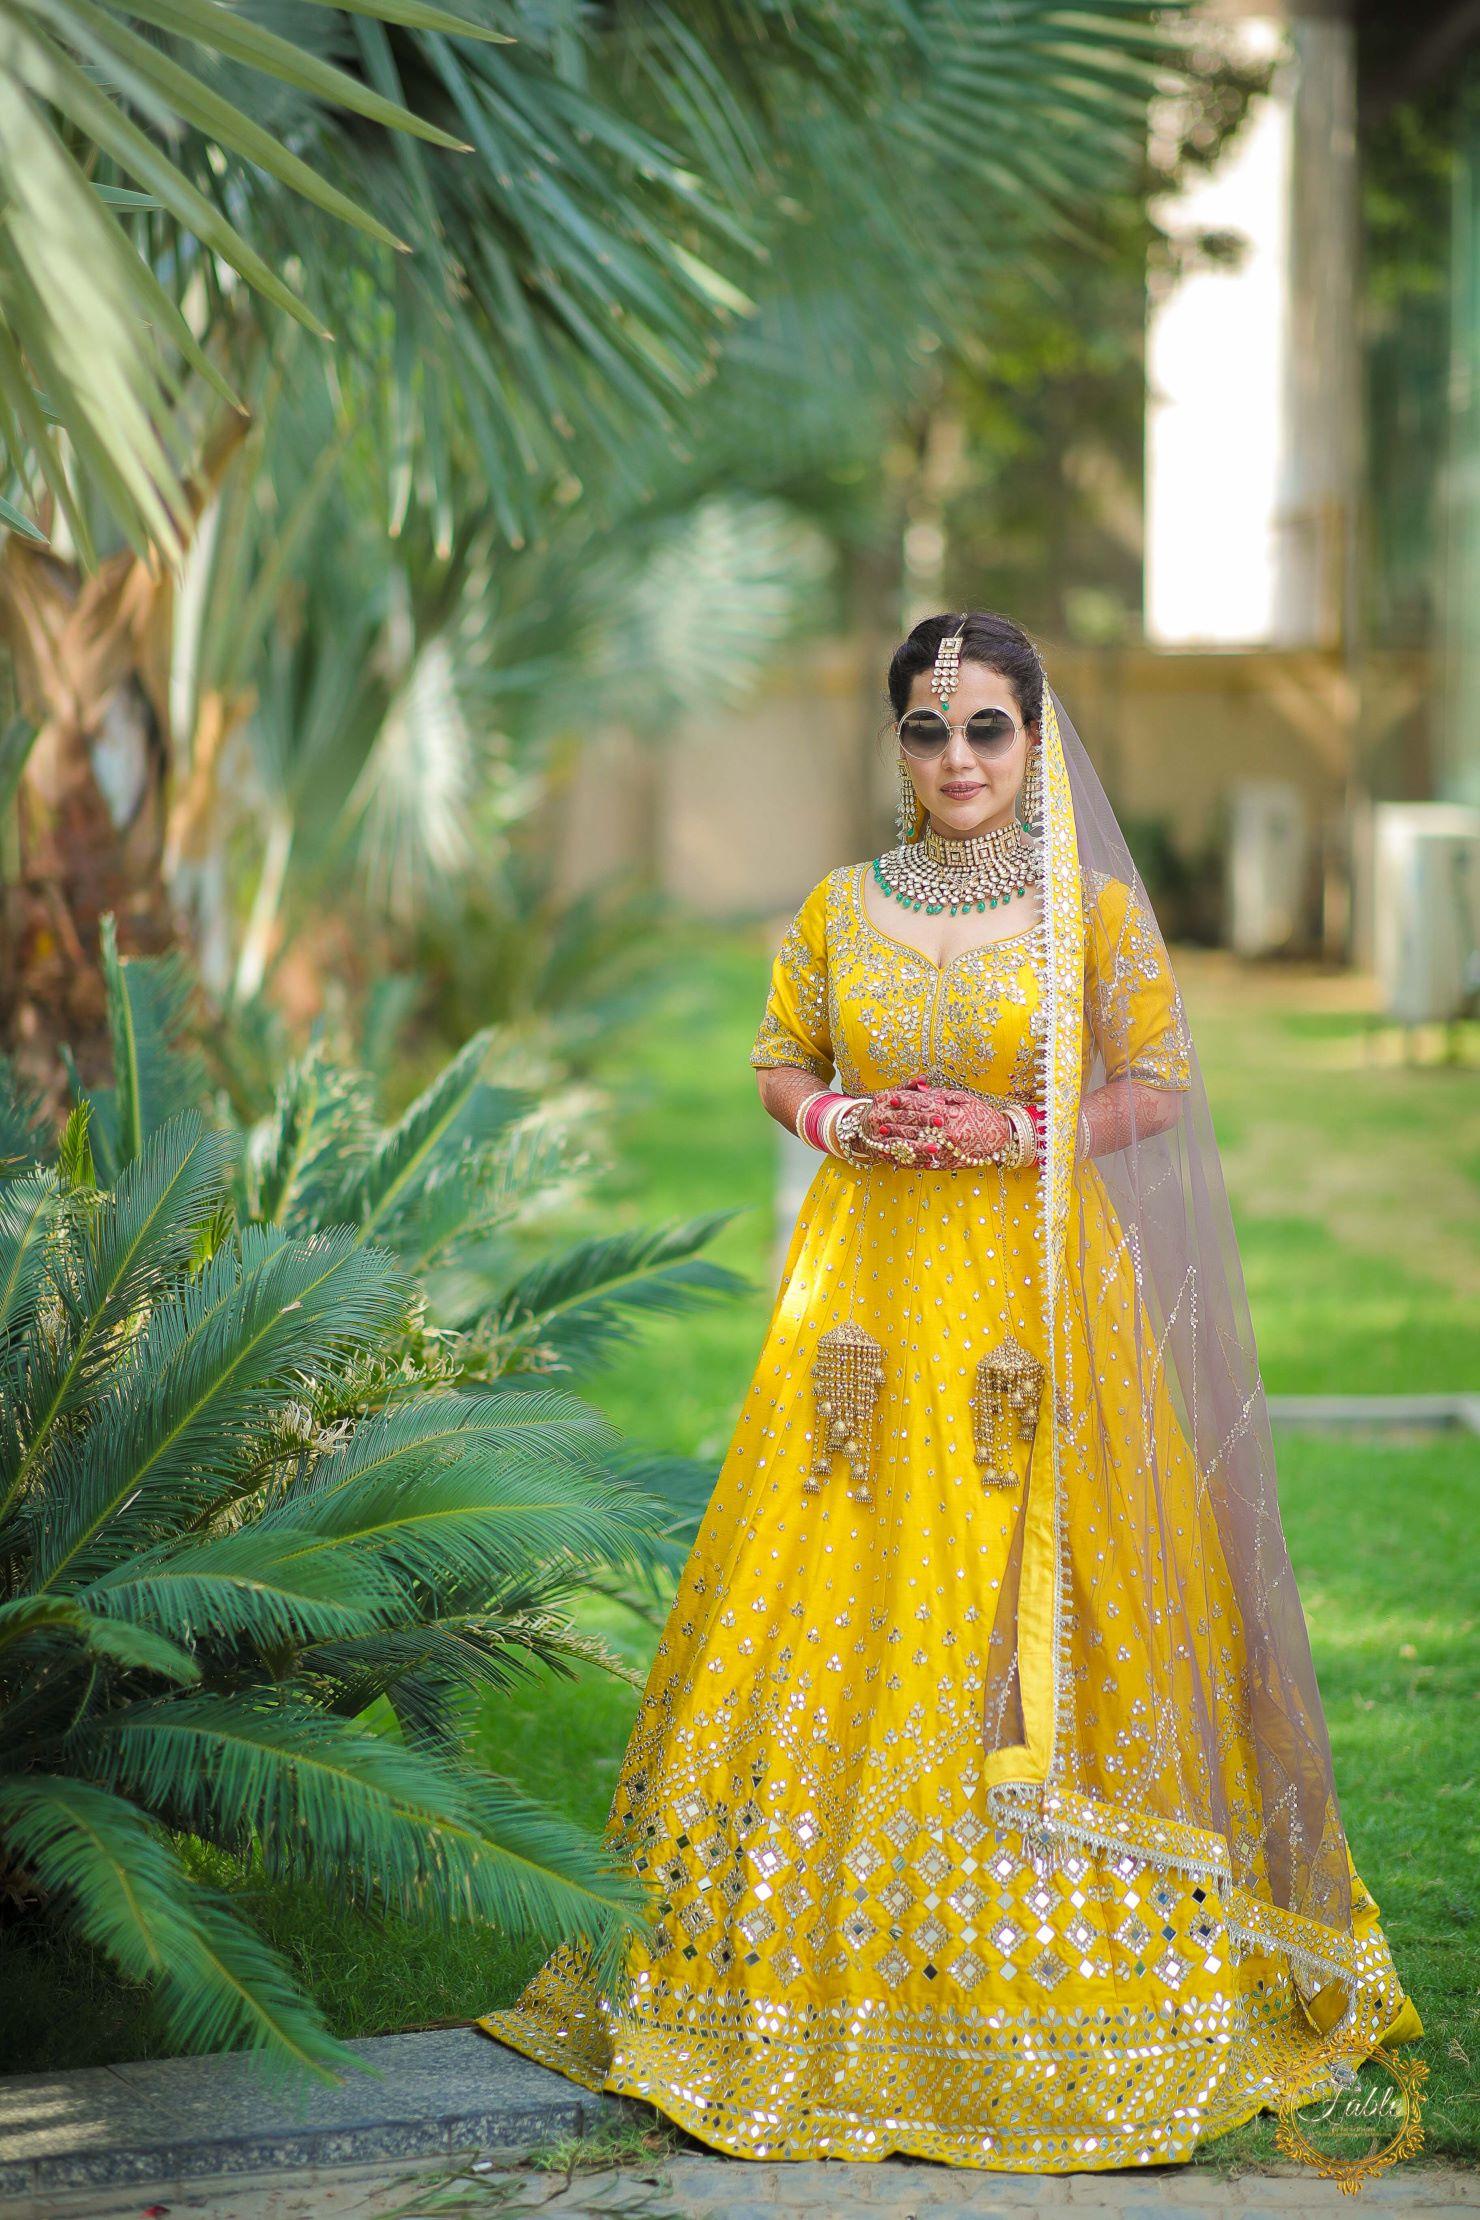 bride in yellow bridal lehenga and shades